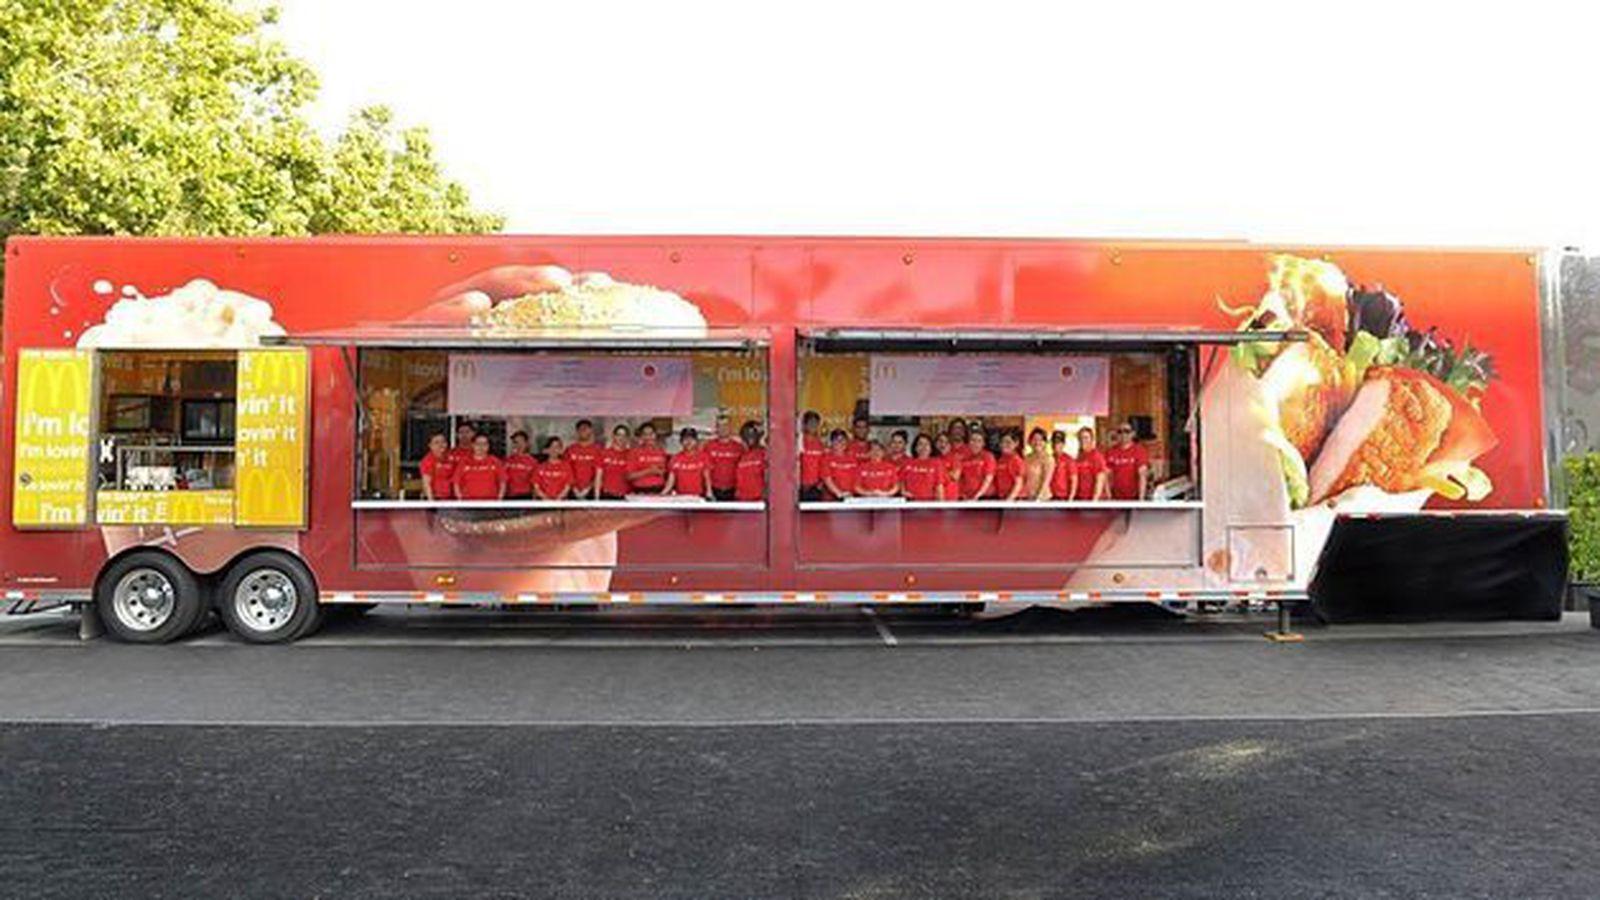 Follow That Food Truck